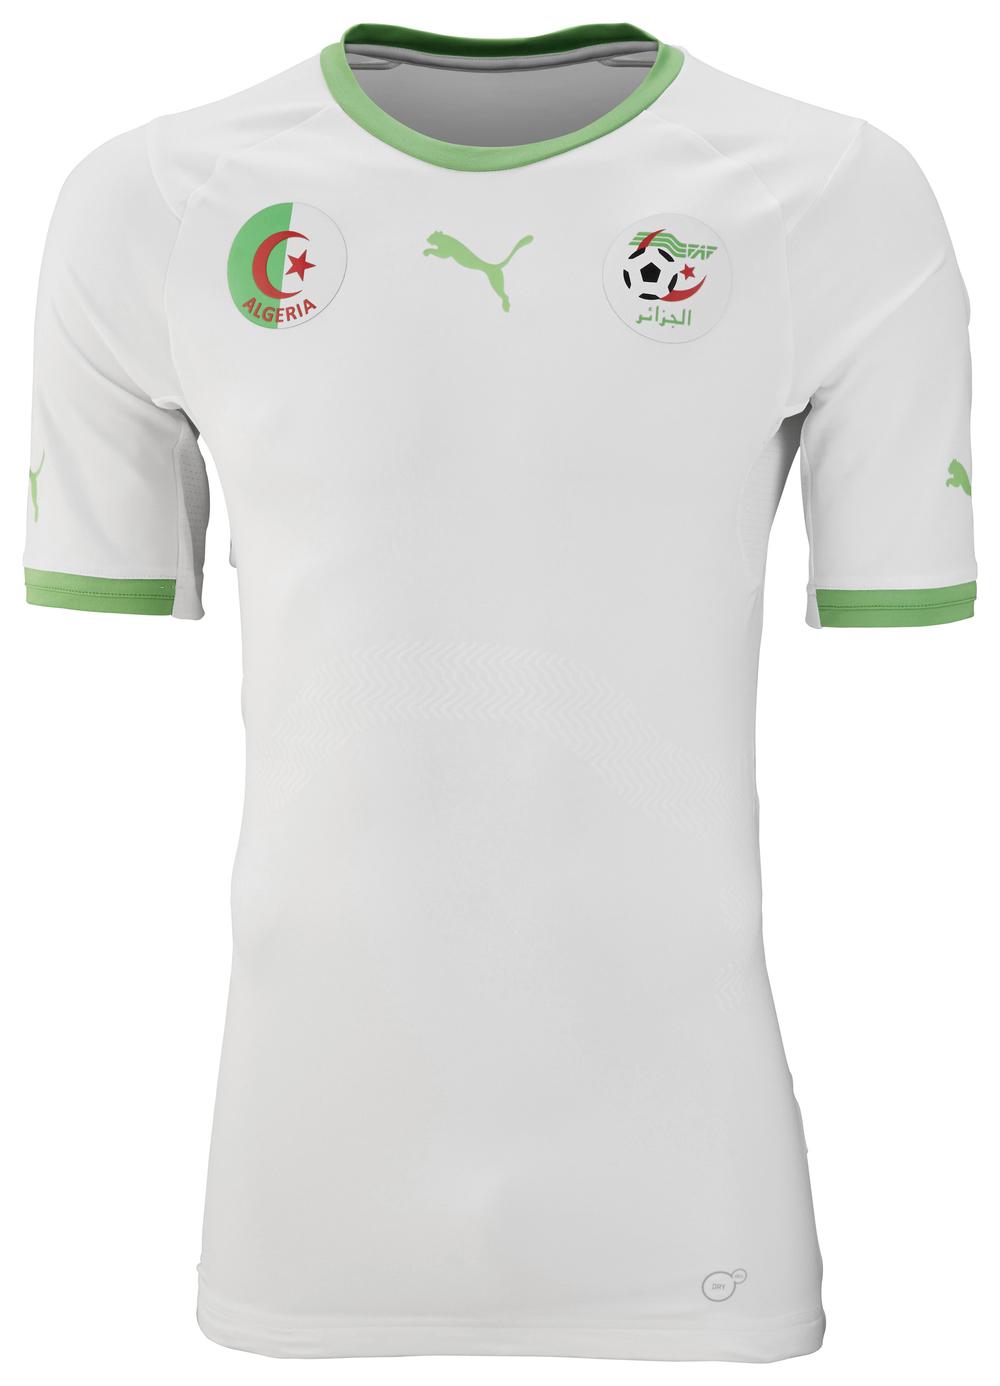 SS14 Algeria Home Promo ACTV Jersey_744601_01.jpg